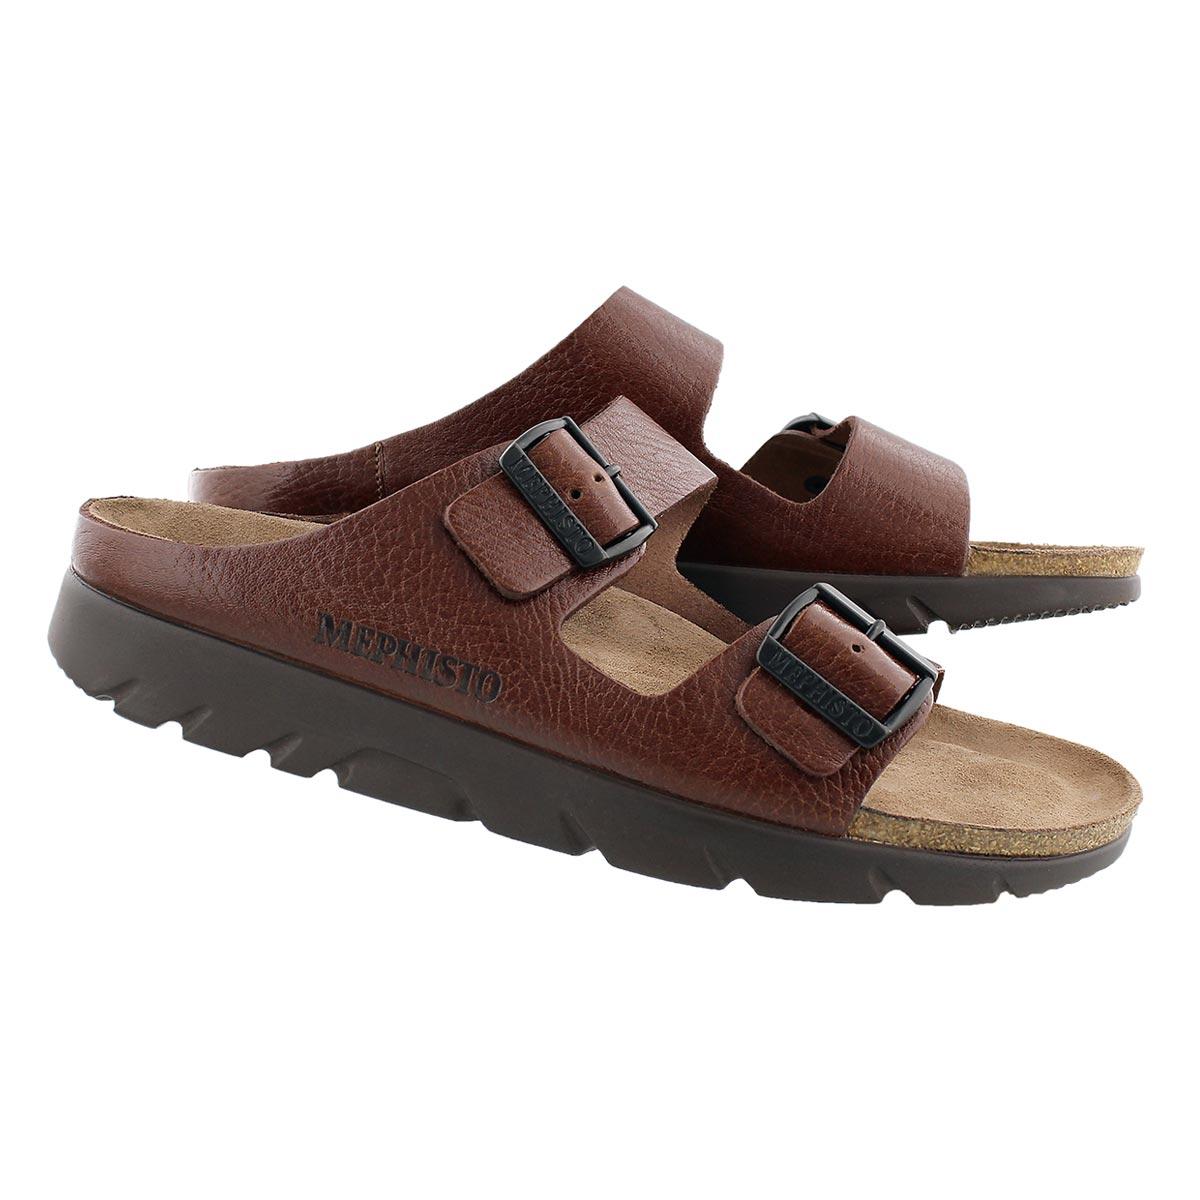 Sandale ZONDER, havane, hommes